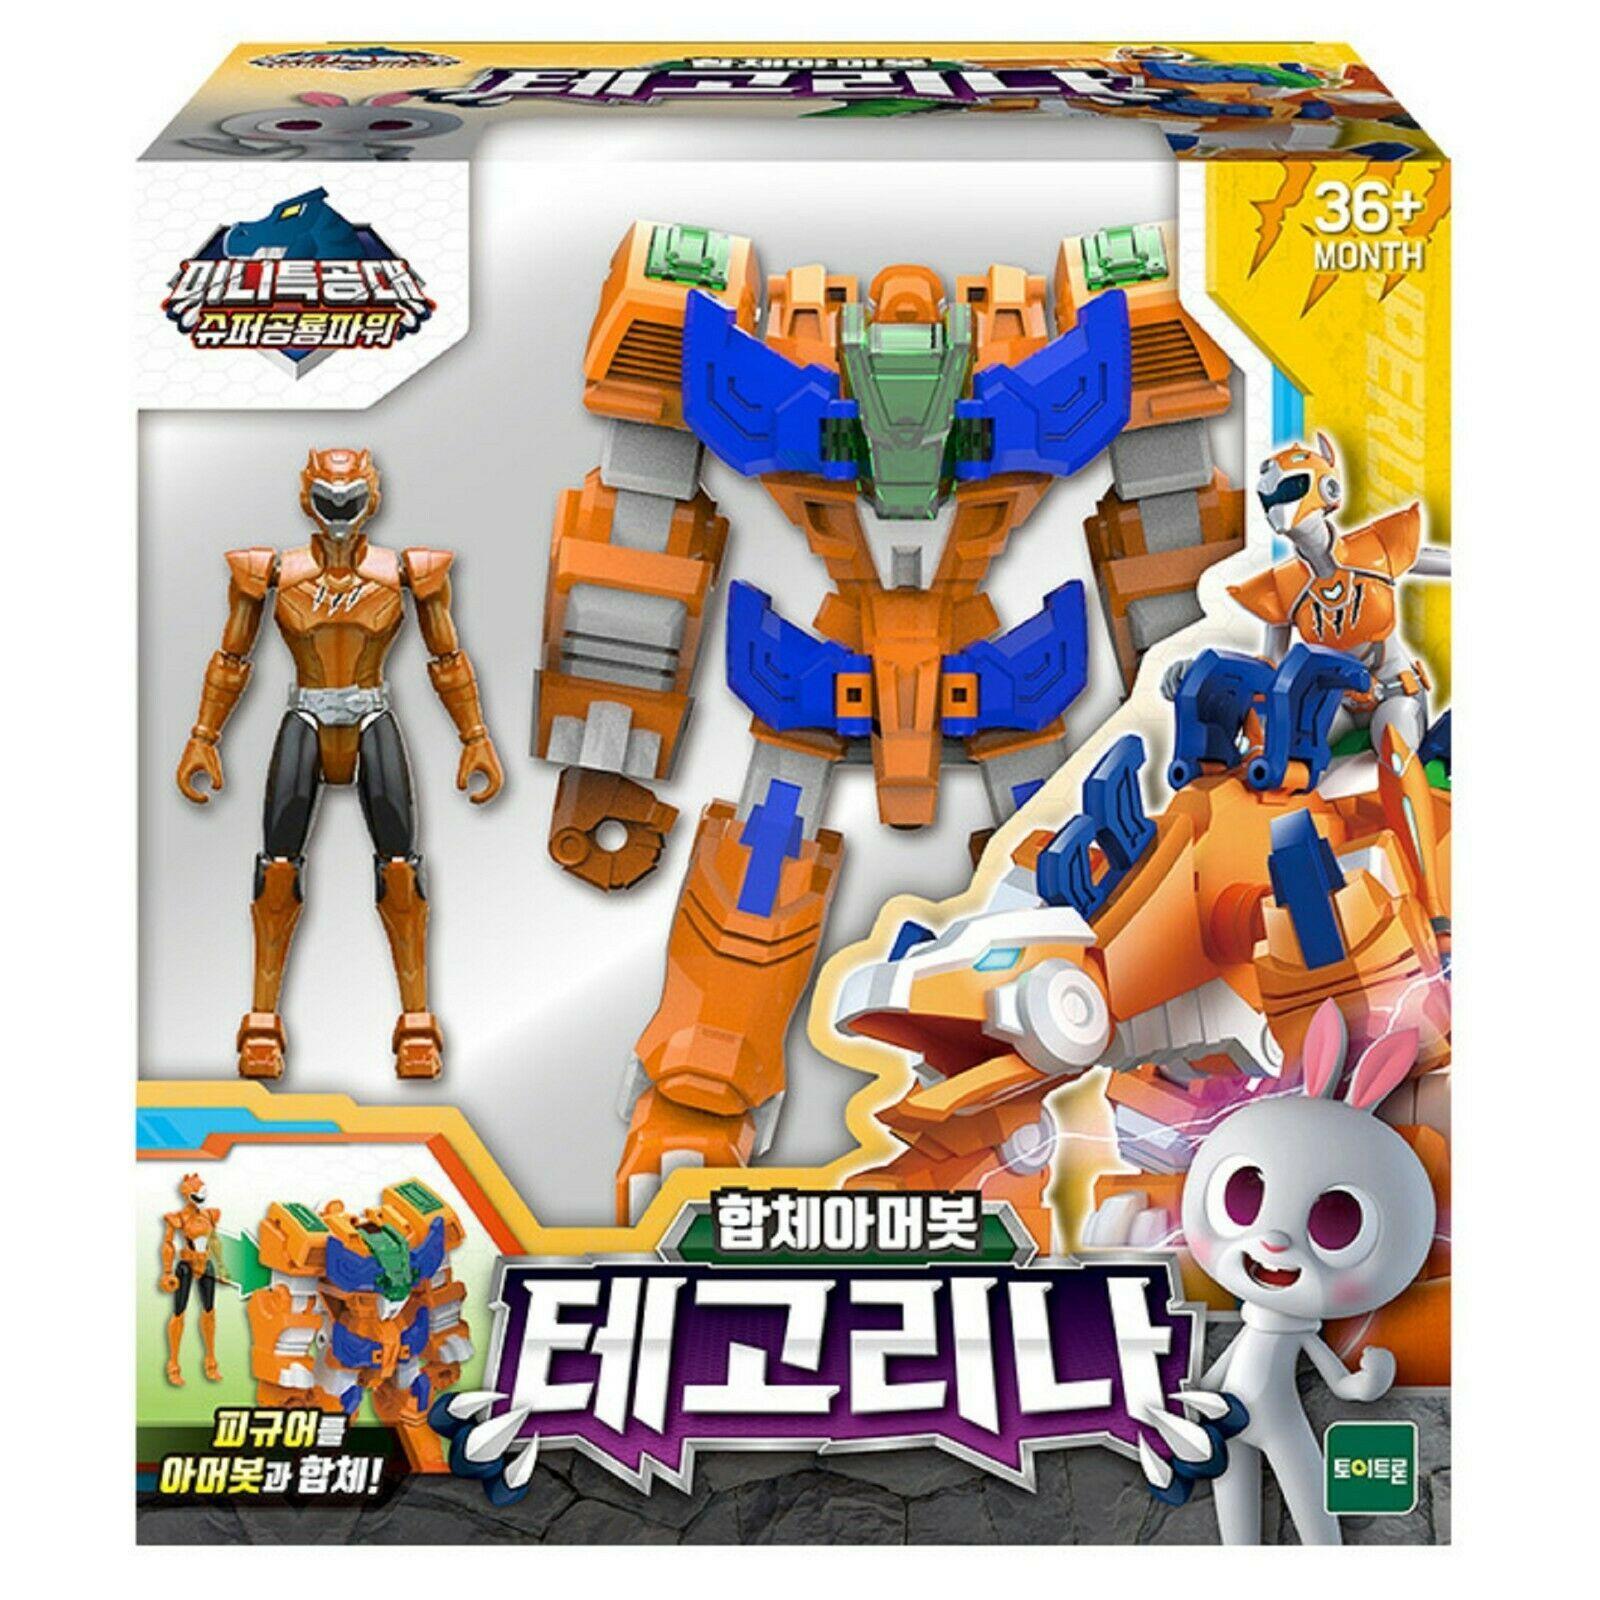 Miniforce Tego Lina Transformation Action Figure Super Dinosaur Power Part 2 Toy